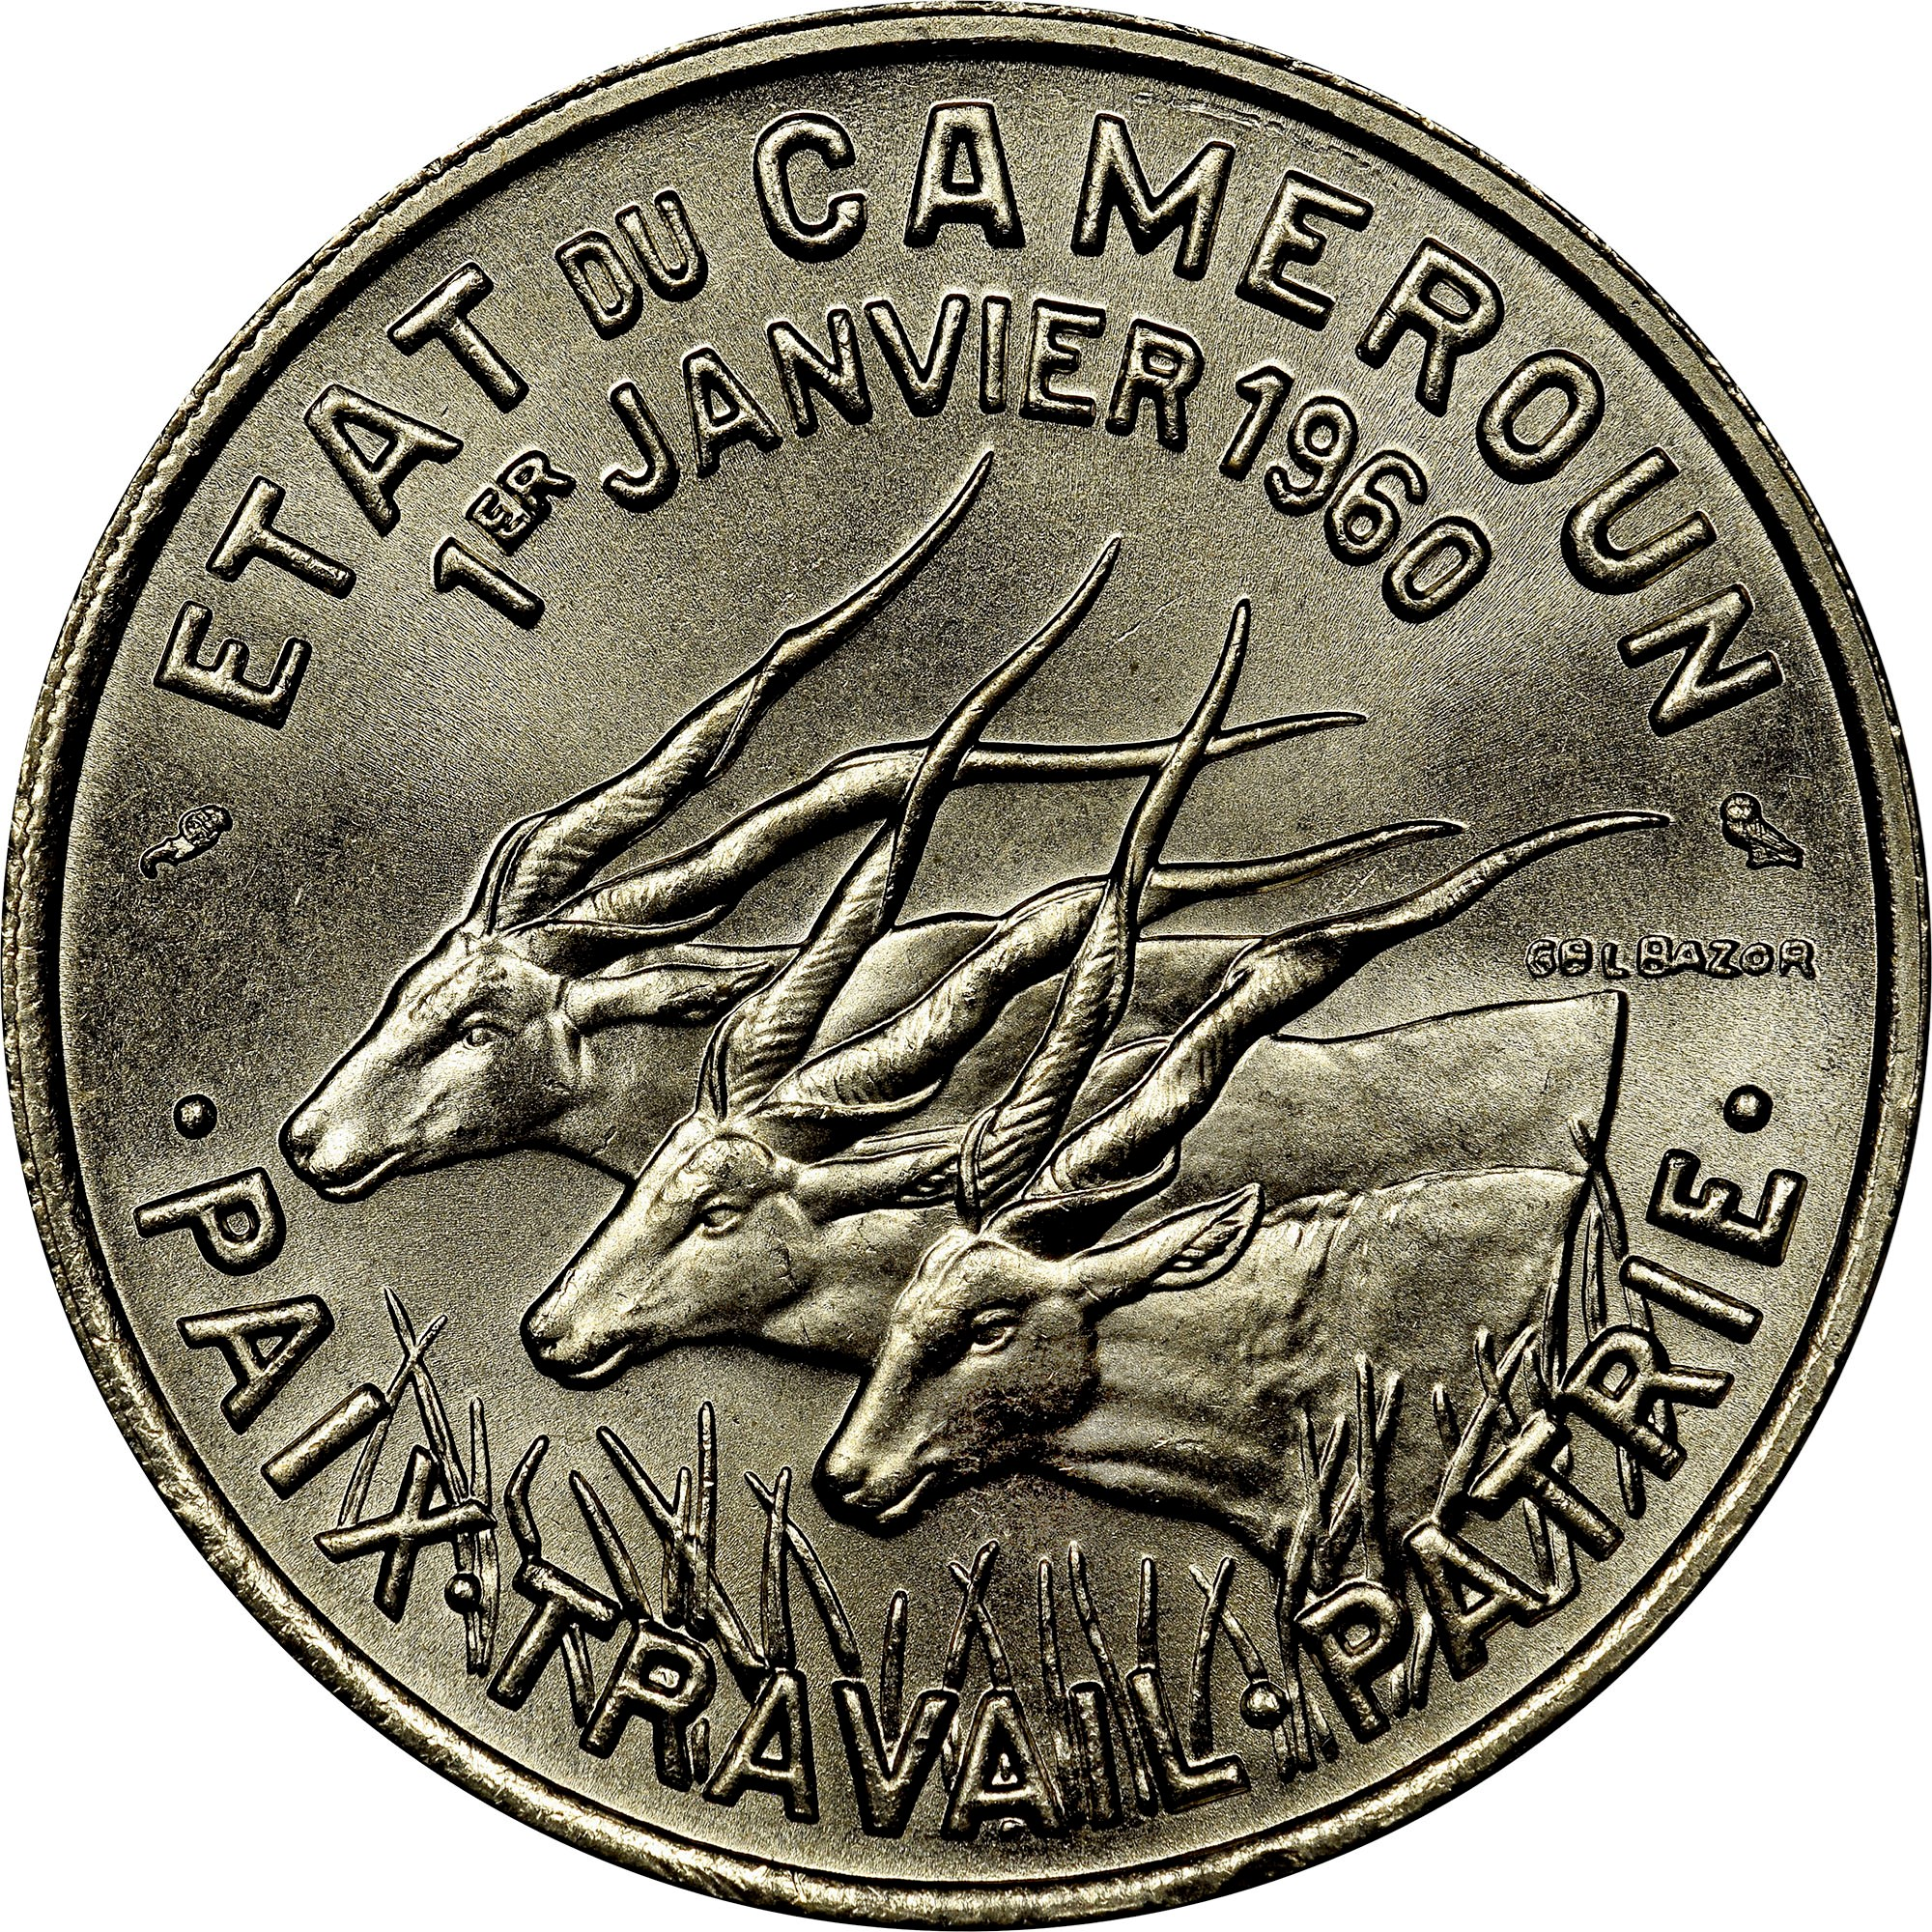 Cameroon 50 Francs obverse